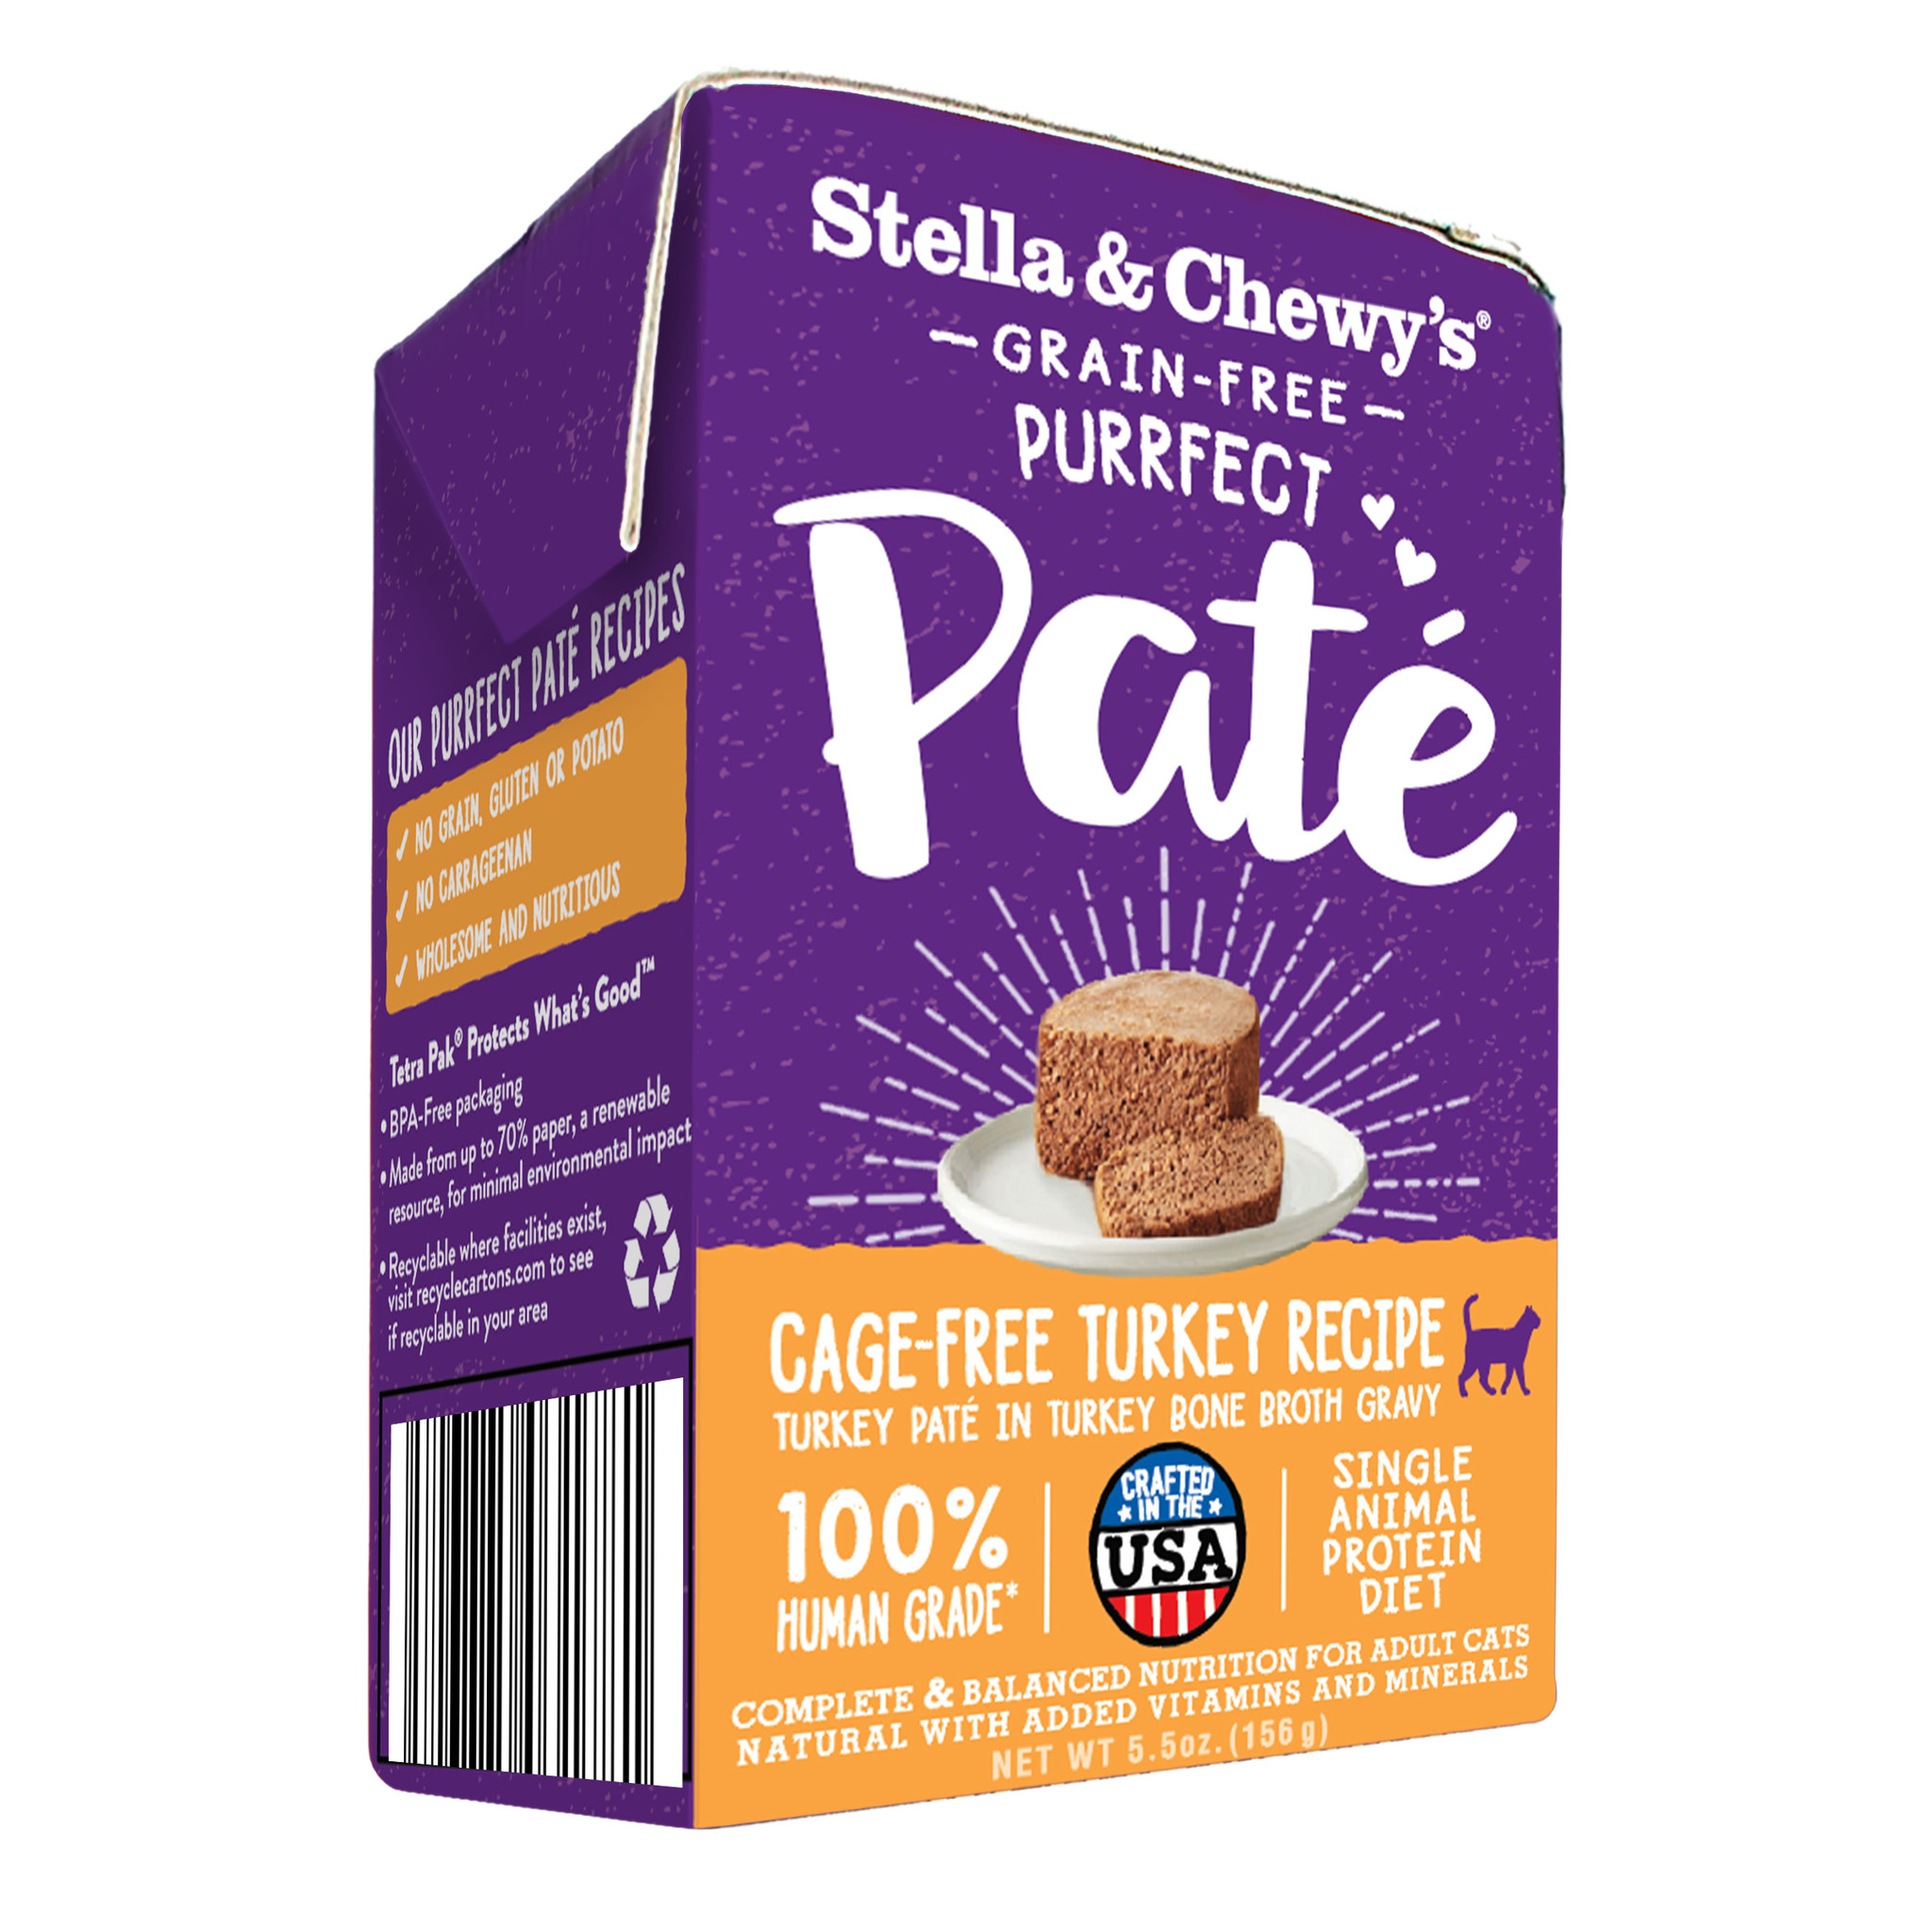 Stella & Chewys Stella & Chewys Purrfect Pate Cage Free Turkey Recipe